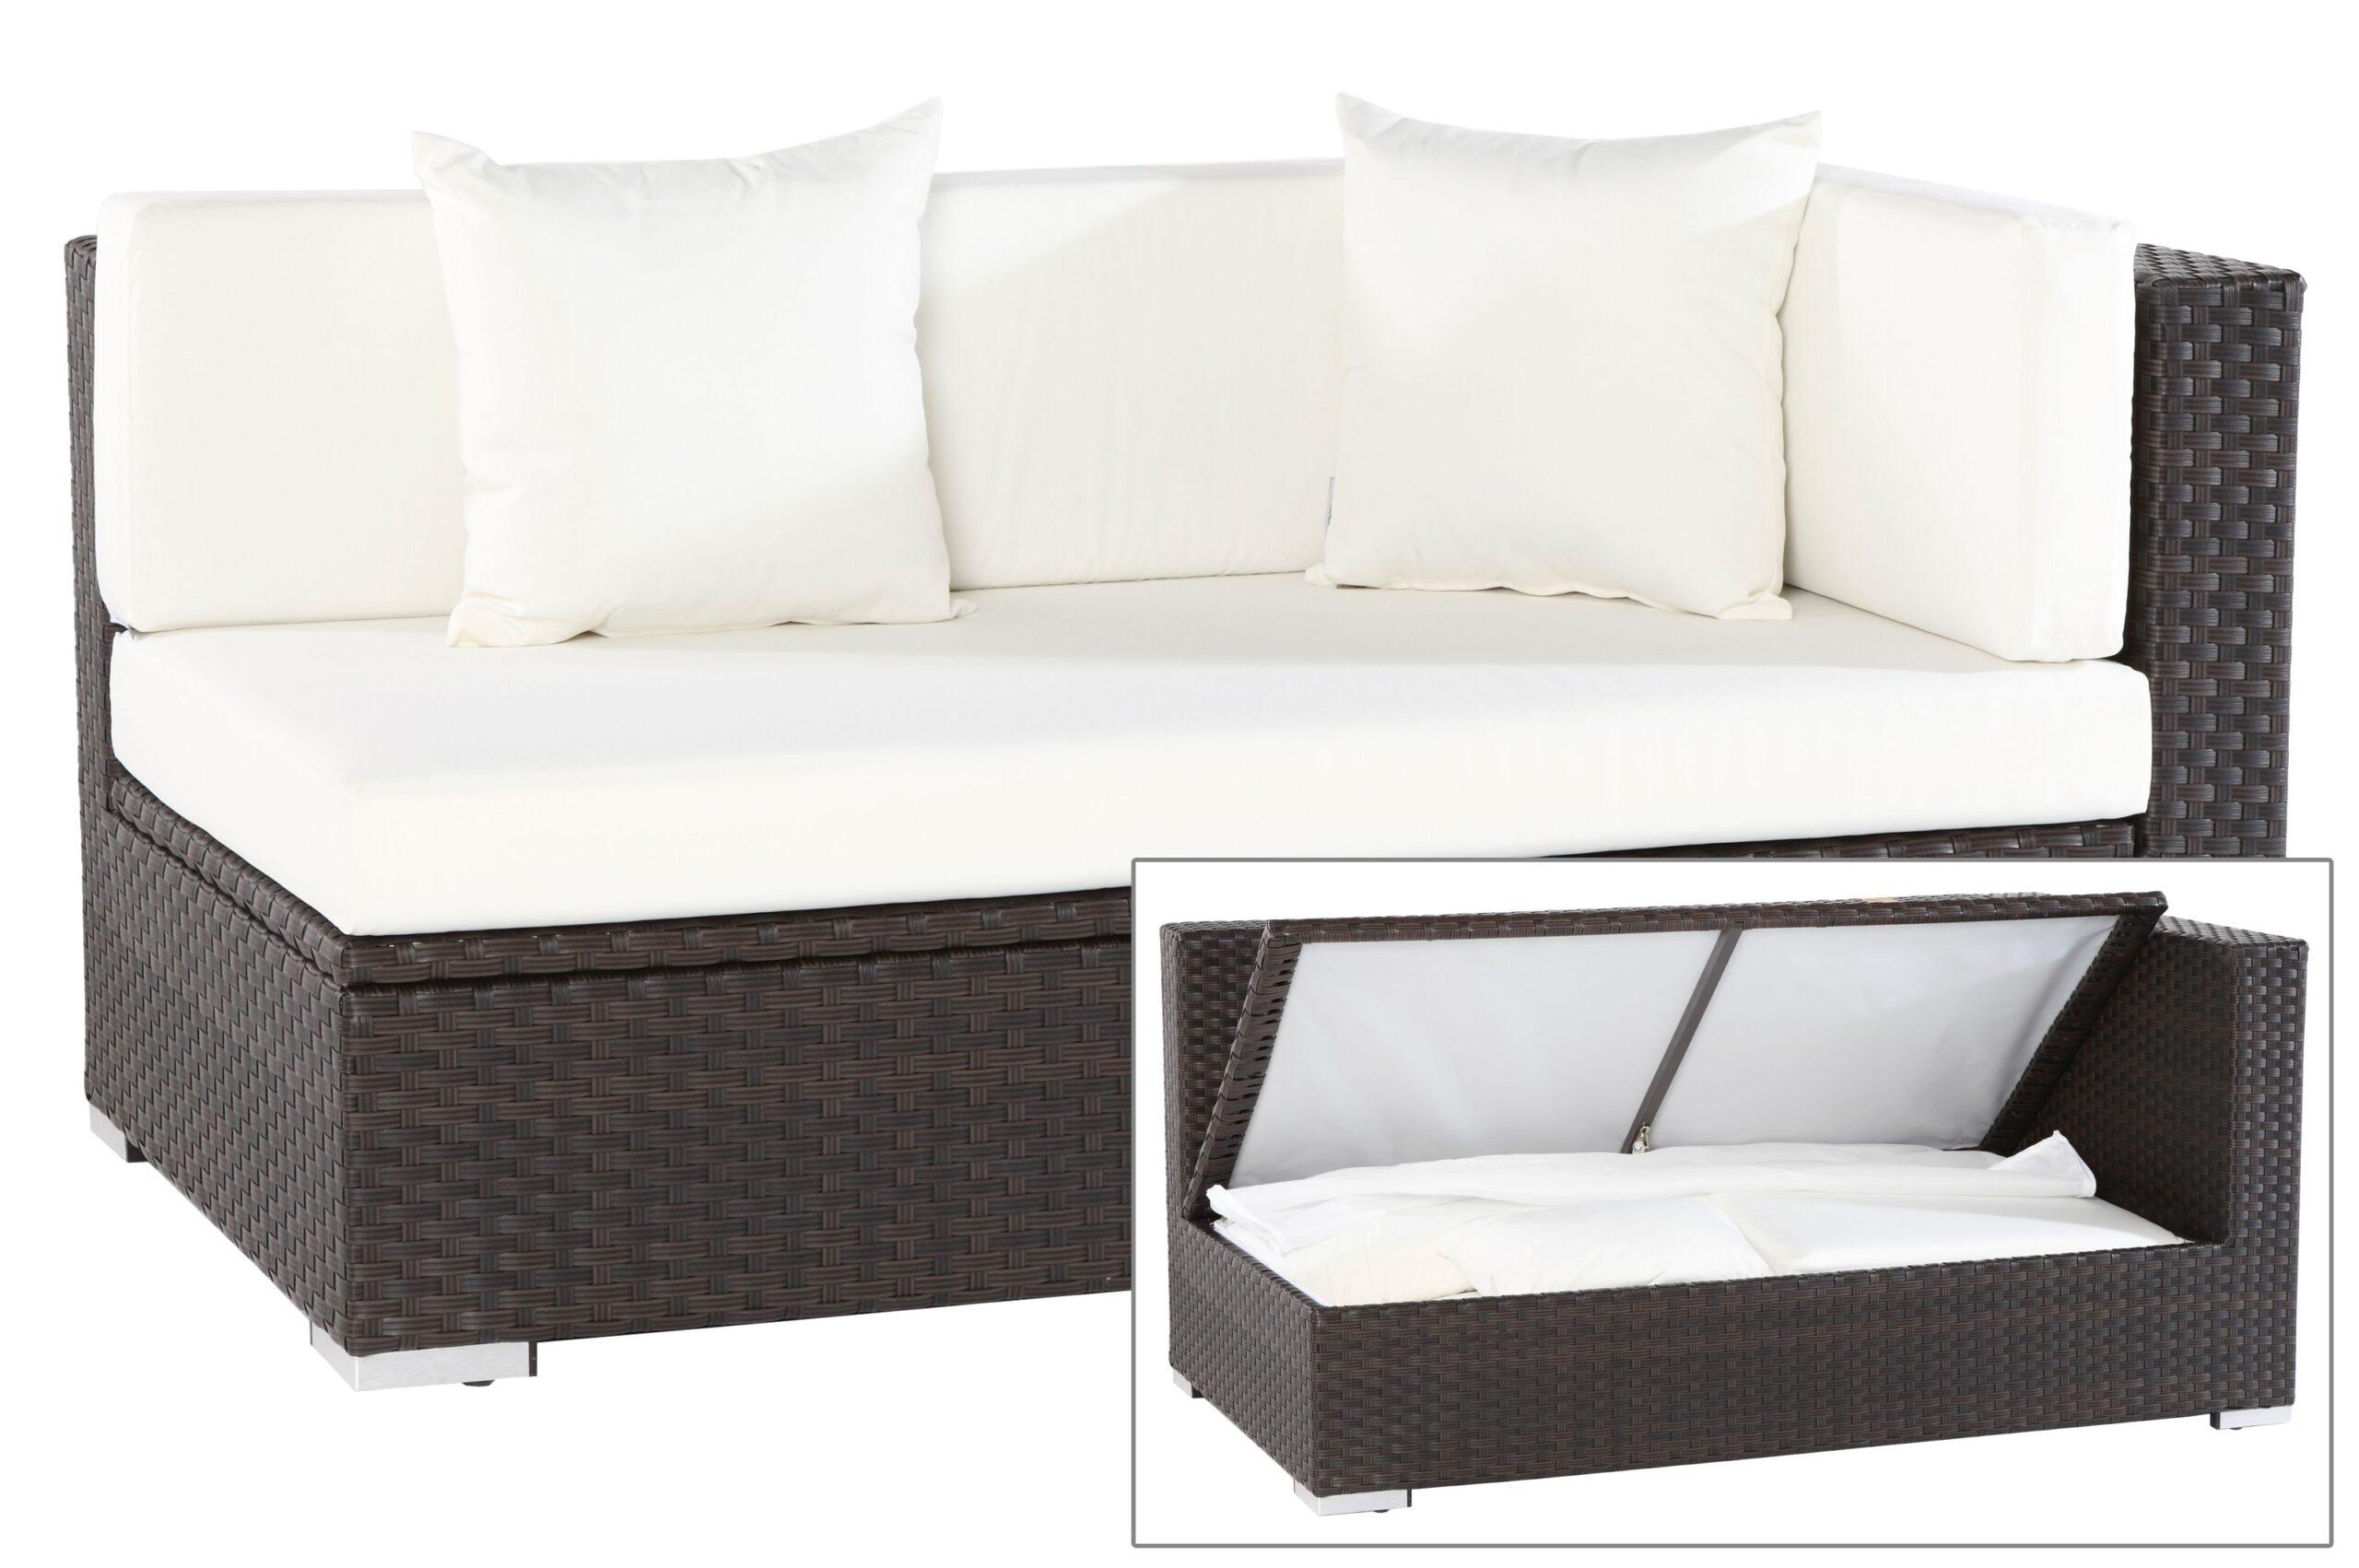 Full Size of Polyrattan Sofa Couch Grau Lounge Ausziehbar Gartensofa 2 Sitzer Balkon Outdoor Set Outflex2 Ecksofa Braun 145x85x70 Links Gartenmoebelde Für Esstisch Sofa Polyrattan Sofa